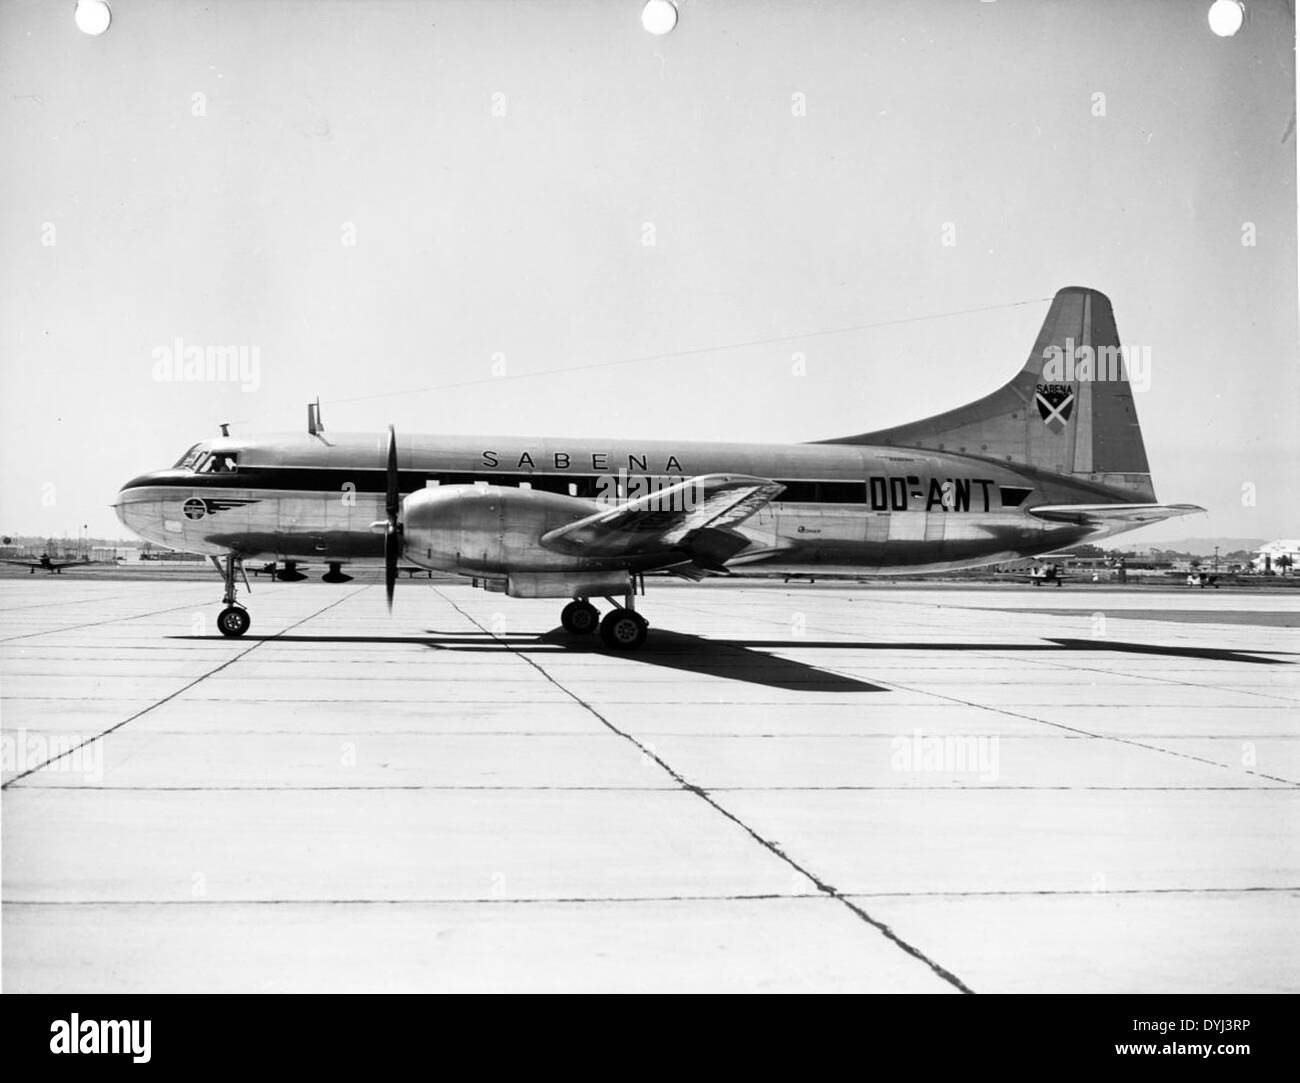 Convair 240 OO-AWT Sabena N20851 Stock Photo